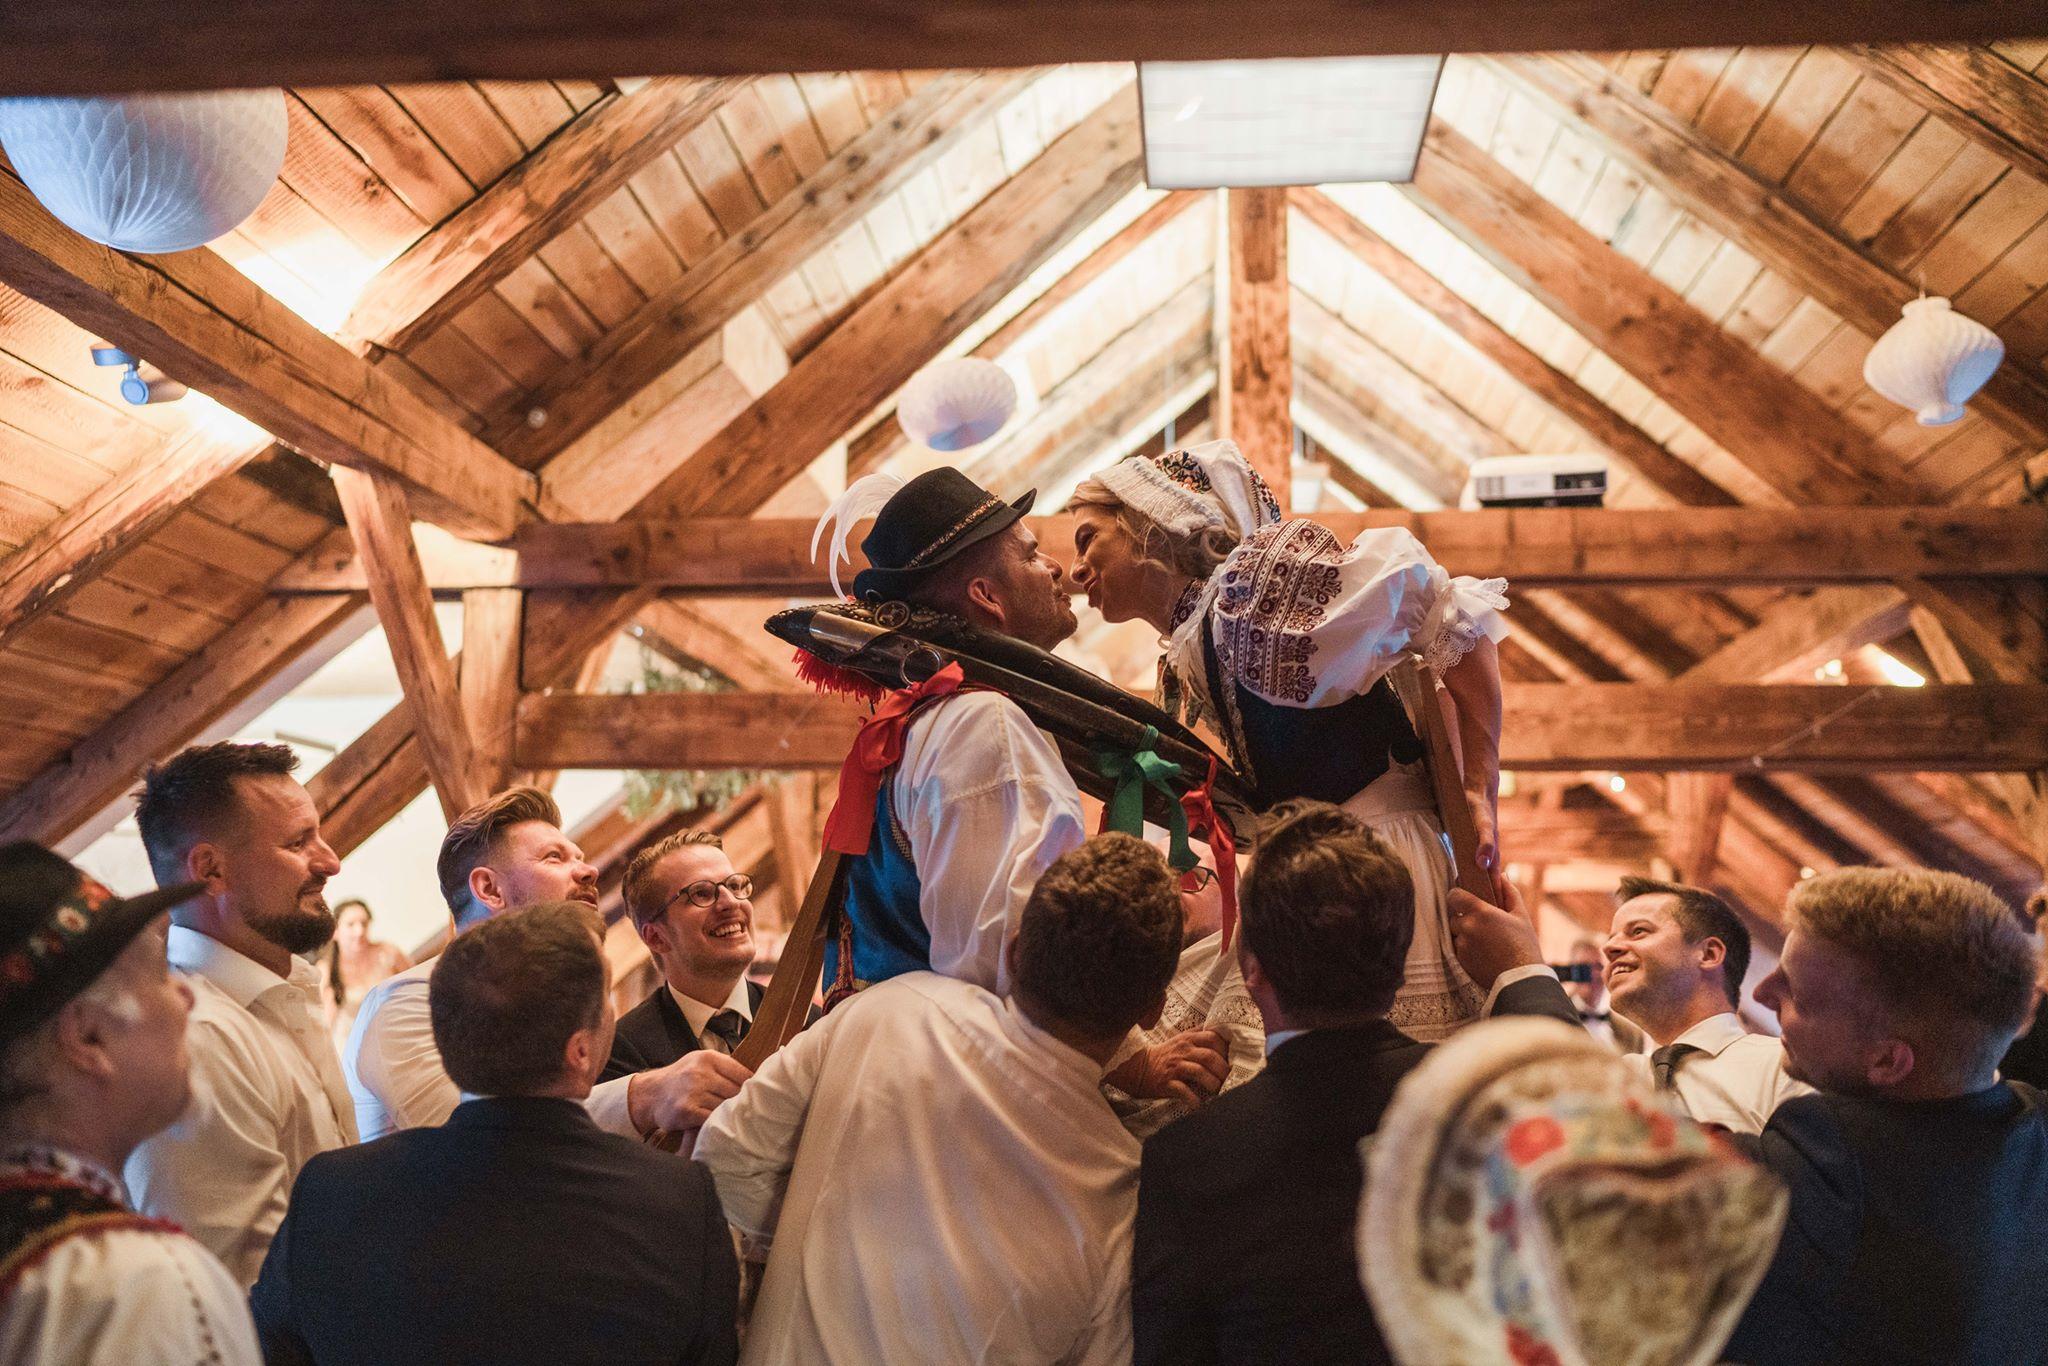 svadba-karpatska-perla-dvihanie-na-stolickachjpg